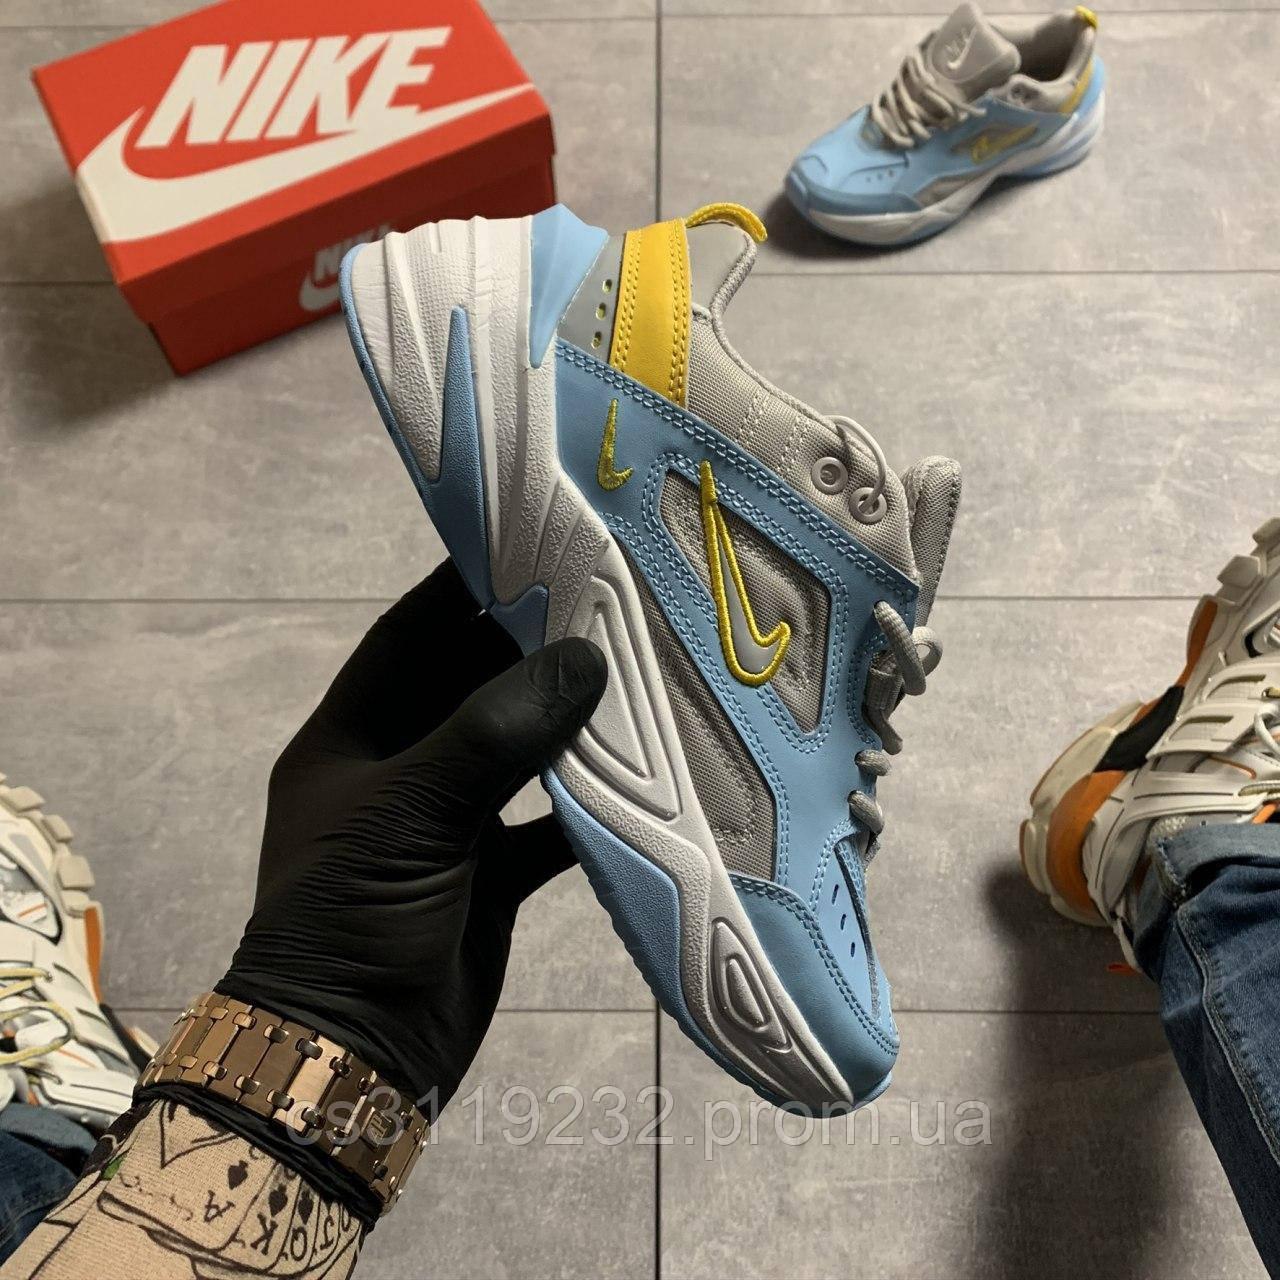 Женские кроссовки Nike M2K Tekno Half Blue/Chrome Yellow (желто-голубые)